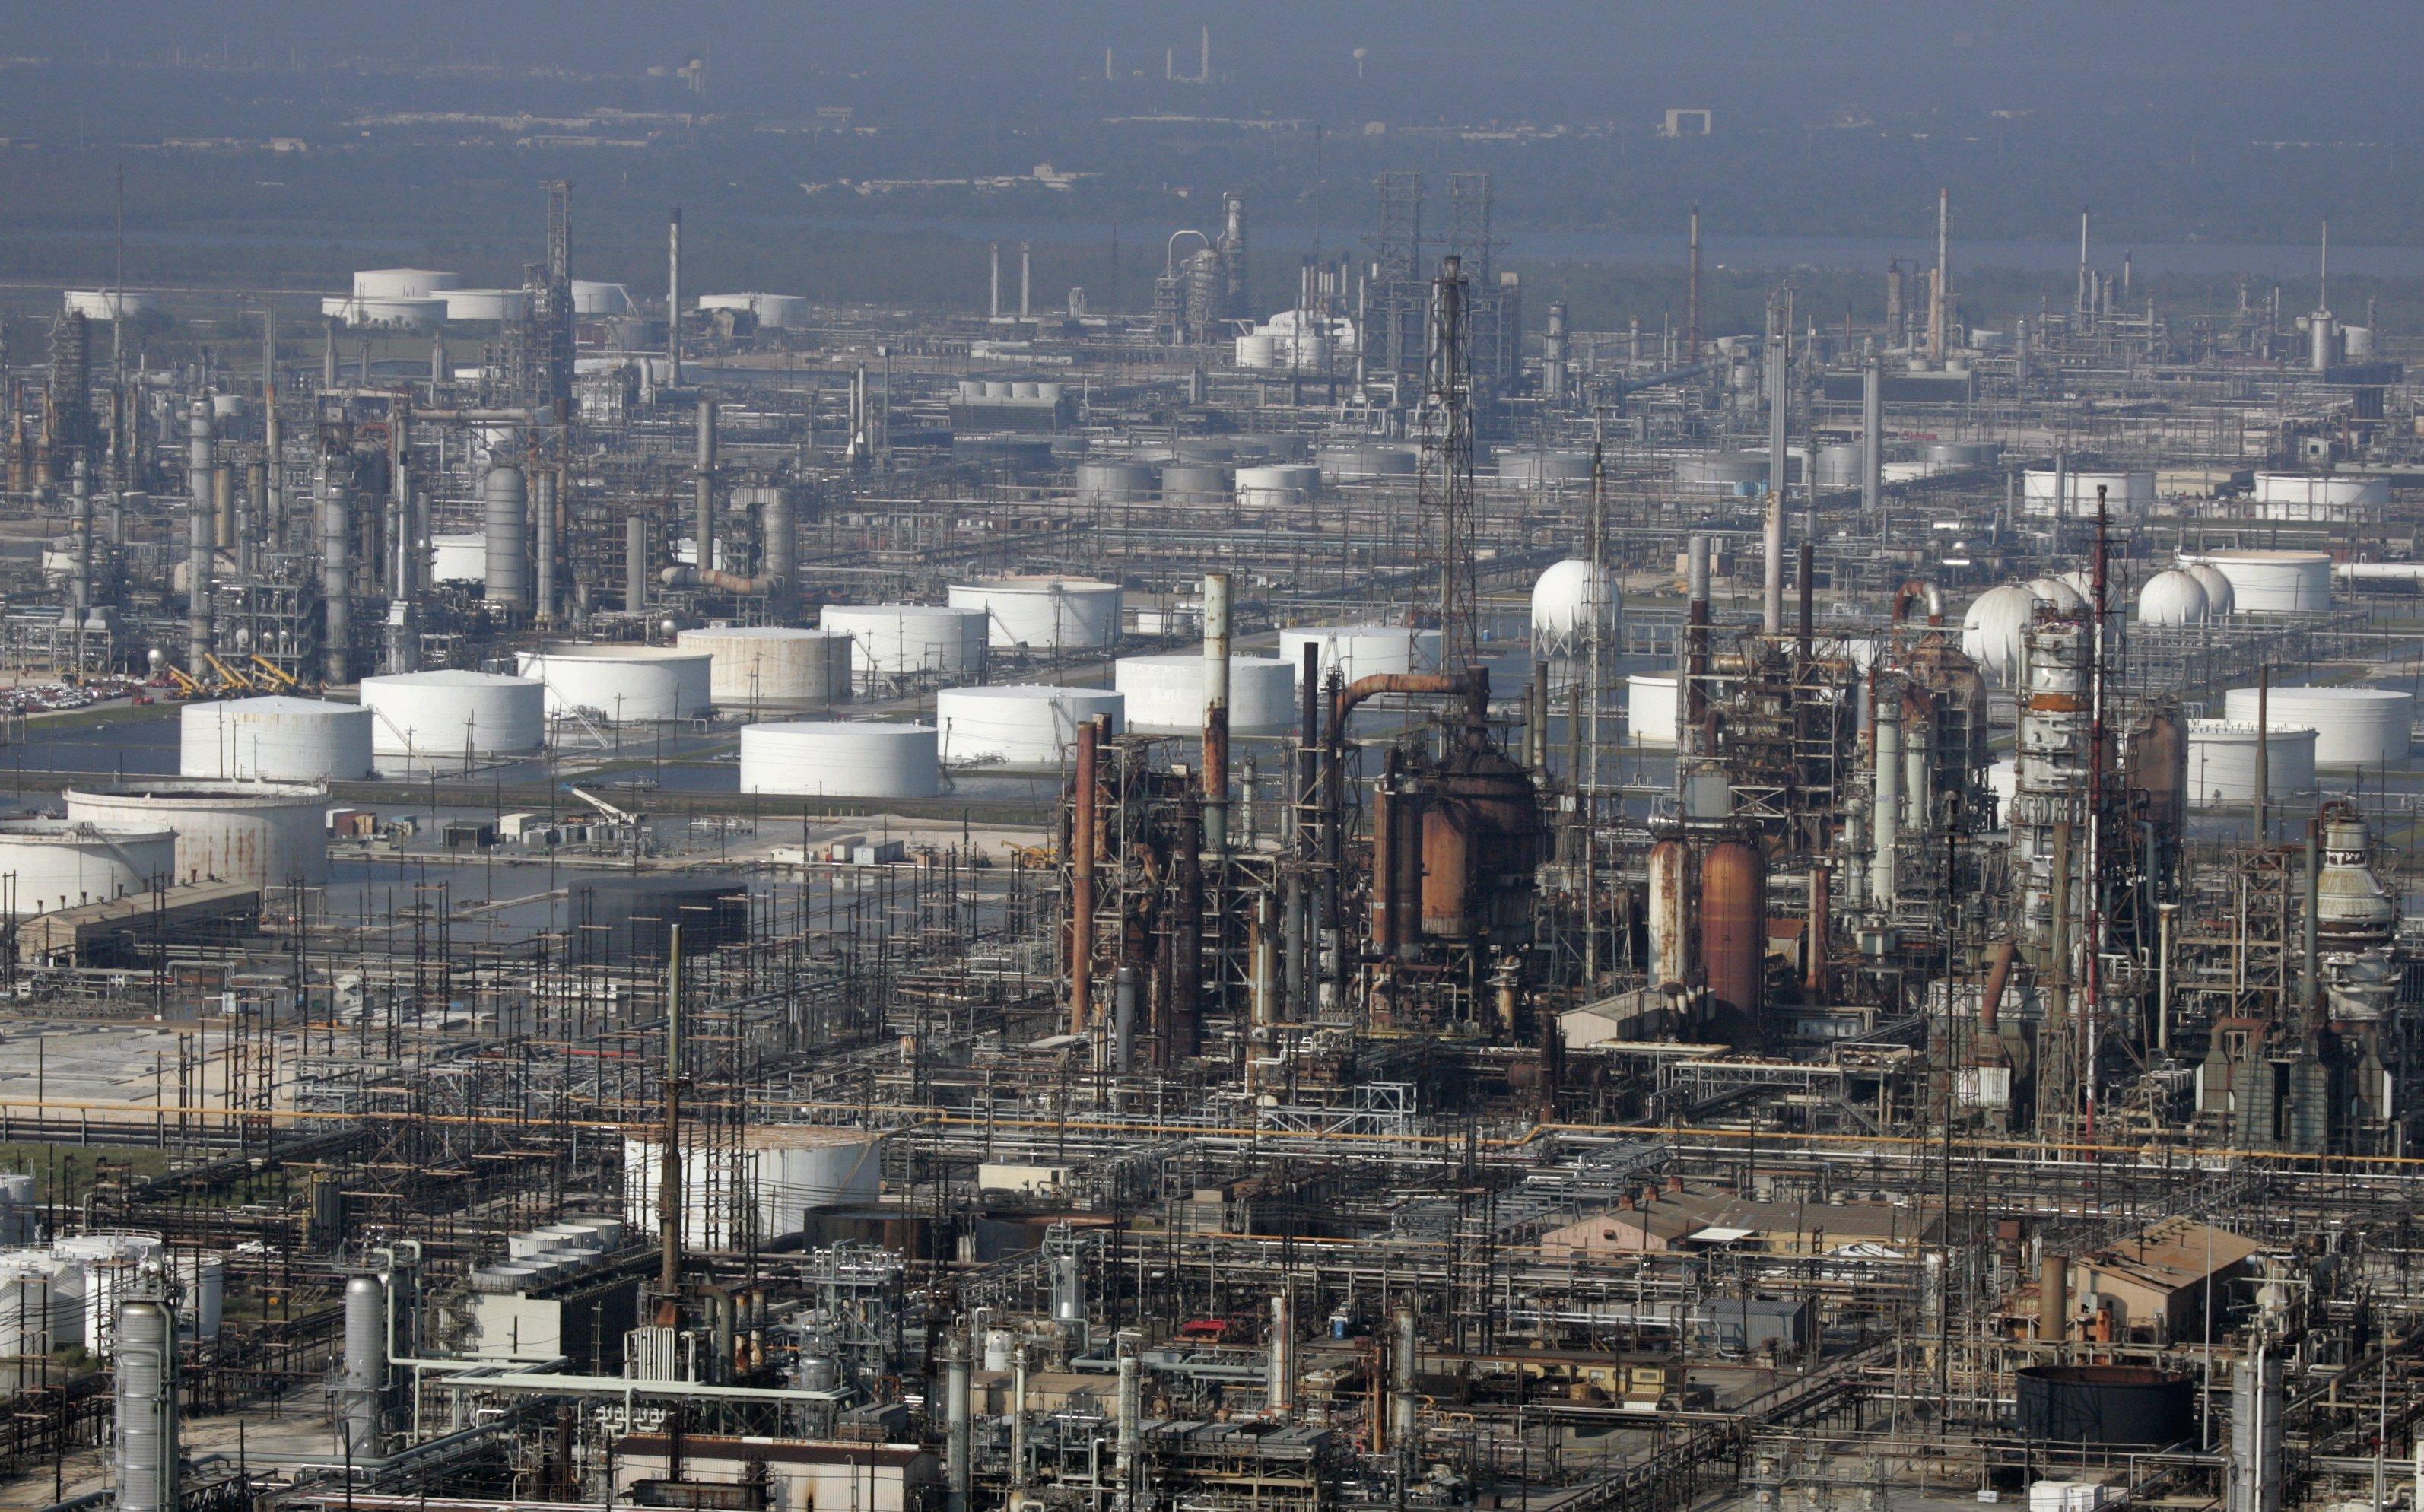 Refinery workers strike spreads to biggest U.S. location ...